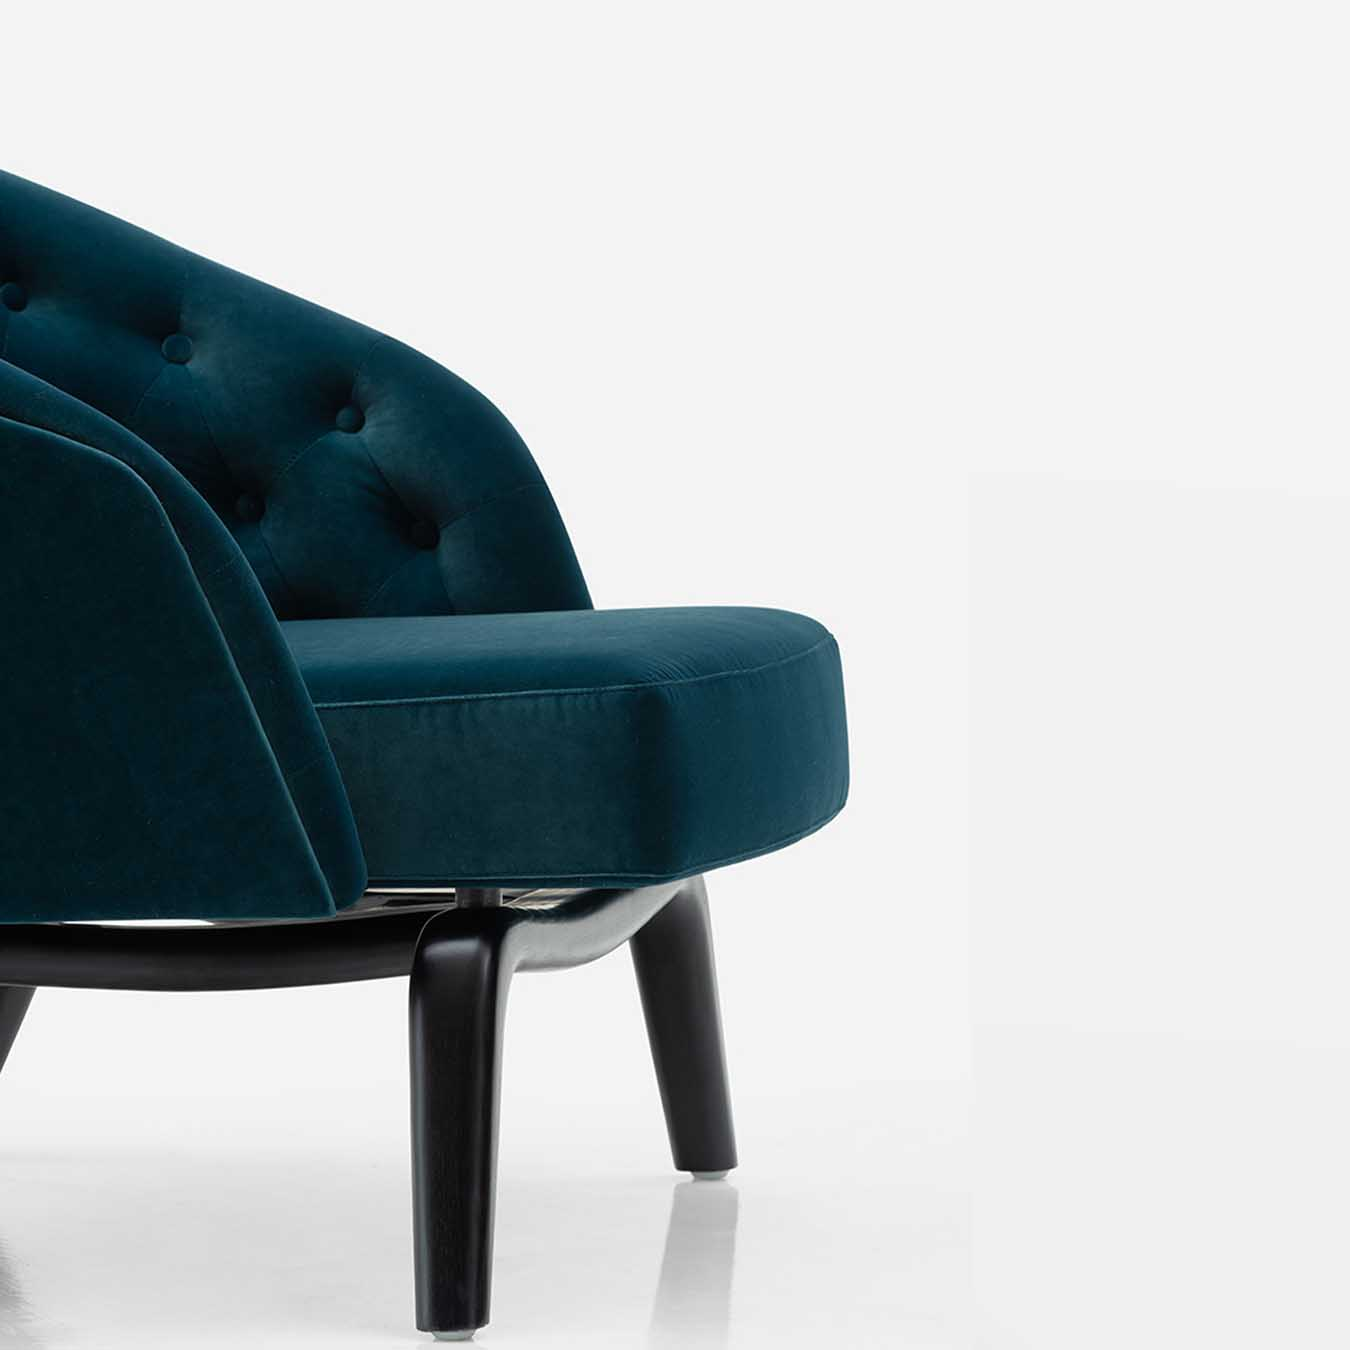 DALTON LEISURE ARMCHAIR PEACOCK BLUE - Casa Lusso ...